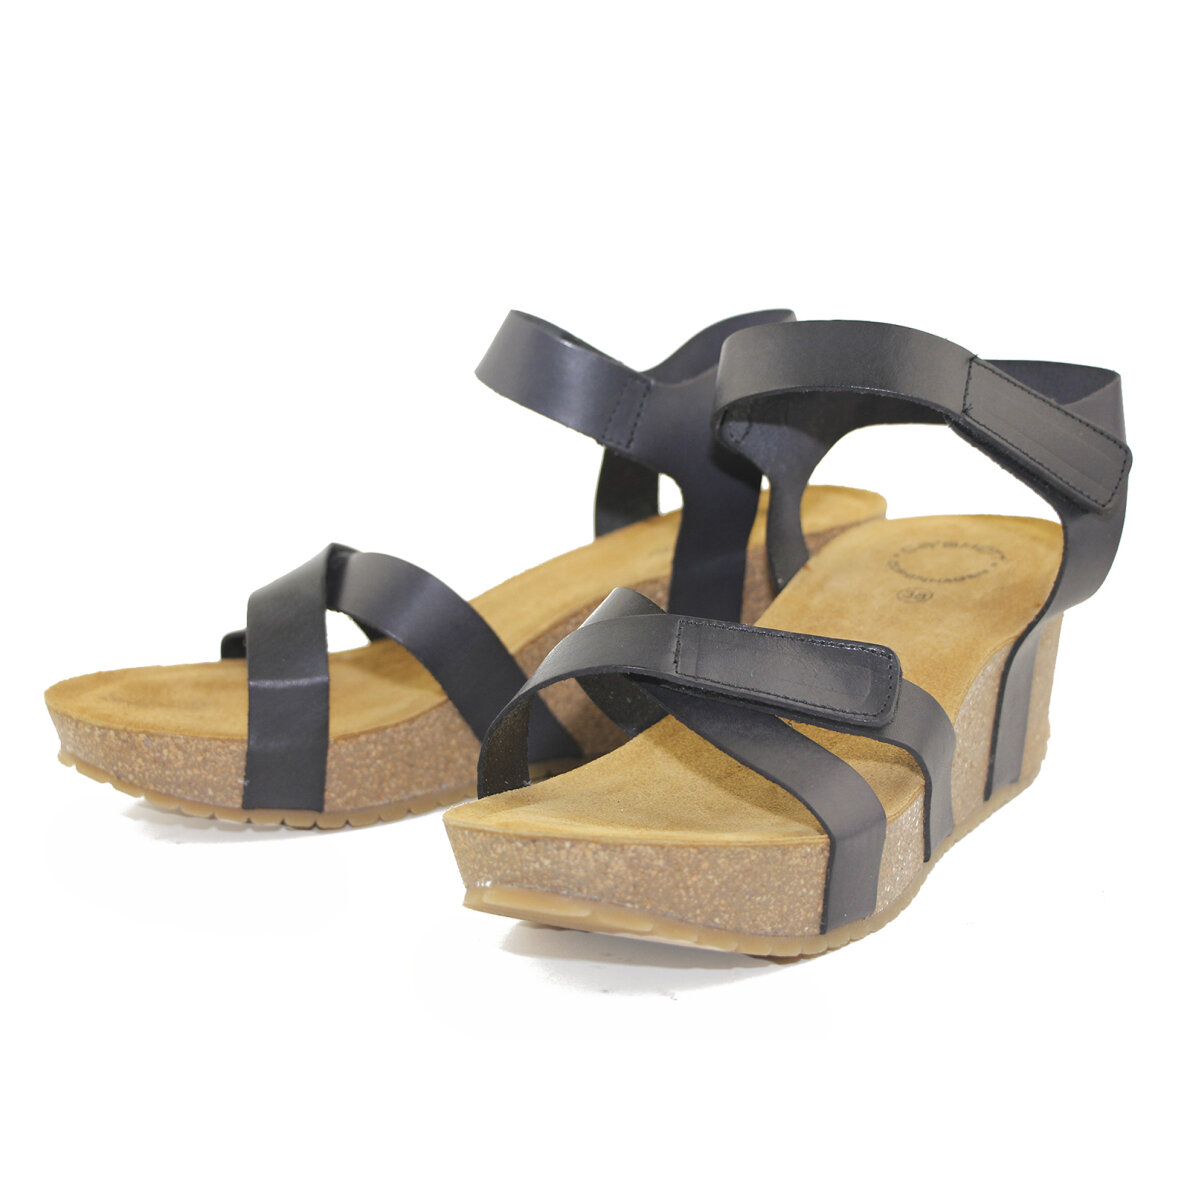 PIEDI Cashott 20271 Sort dame sandal med kilehæl Piedi.dk